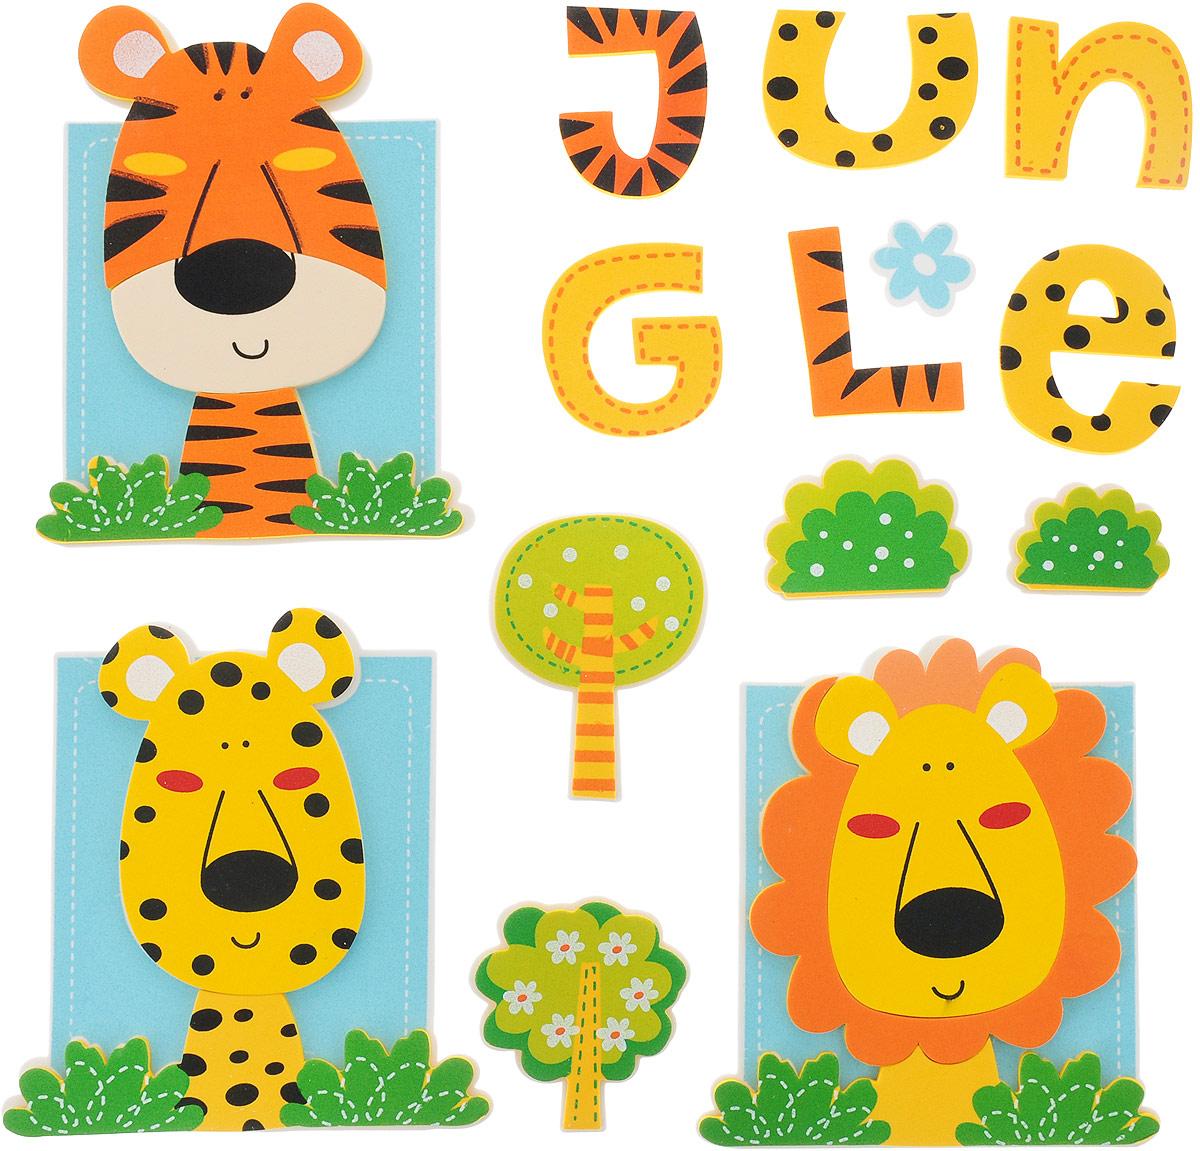 Room Decor Наклейка интерьерная Детские картинки Тигр Леопард Лев 48,5 х 40 см